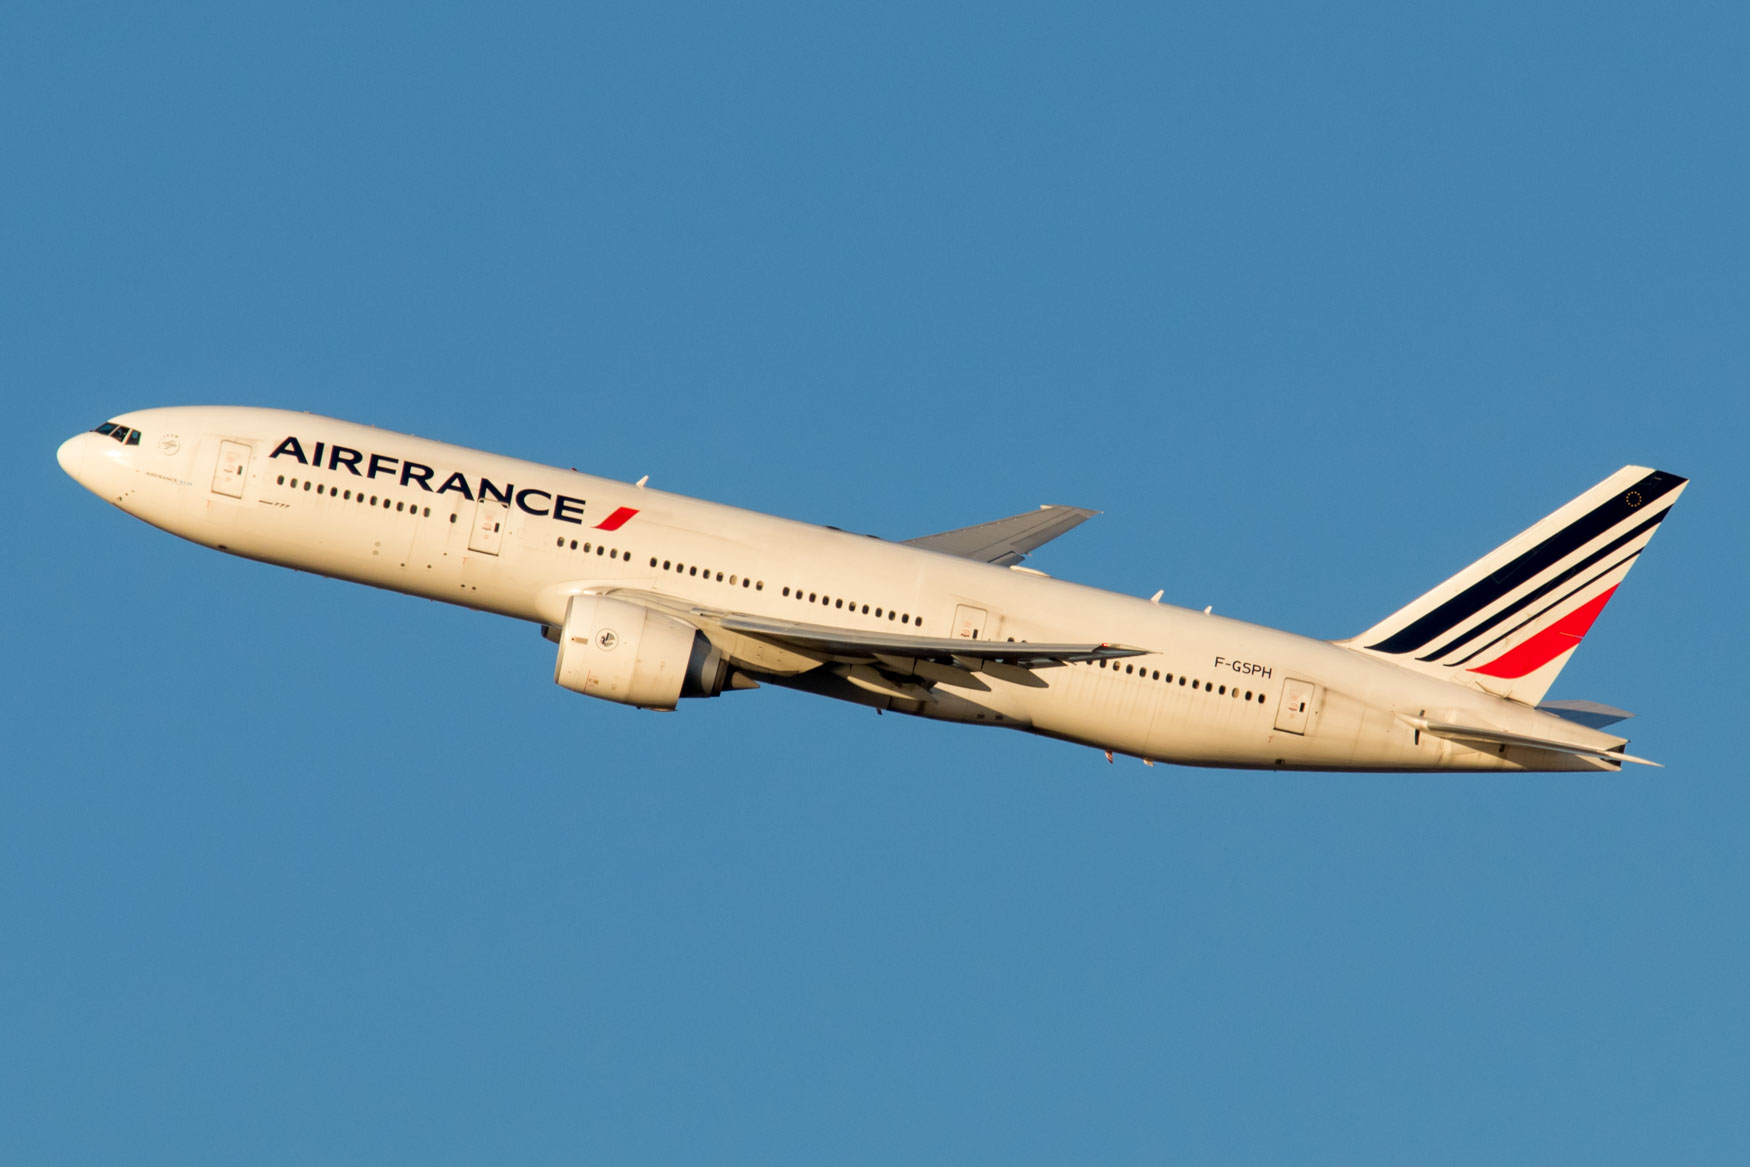 Air France 777-200ER Departing New York